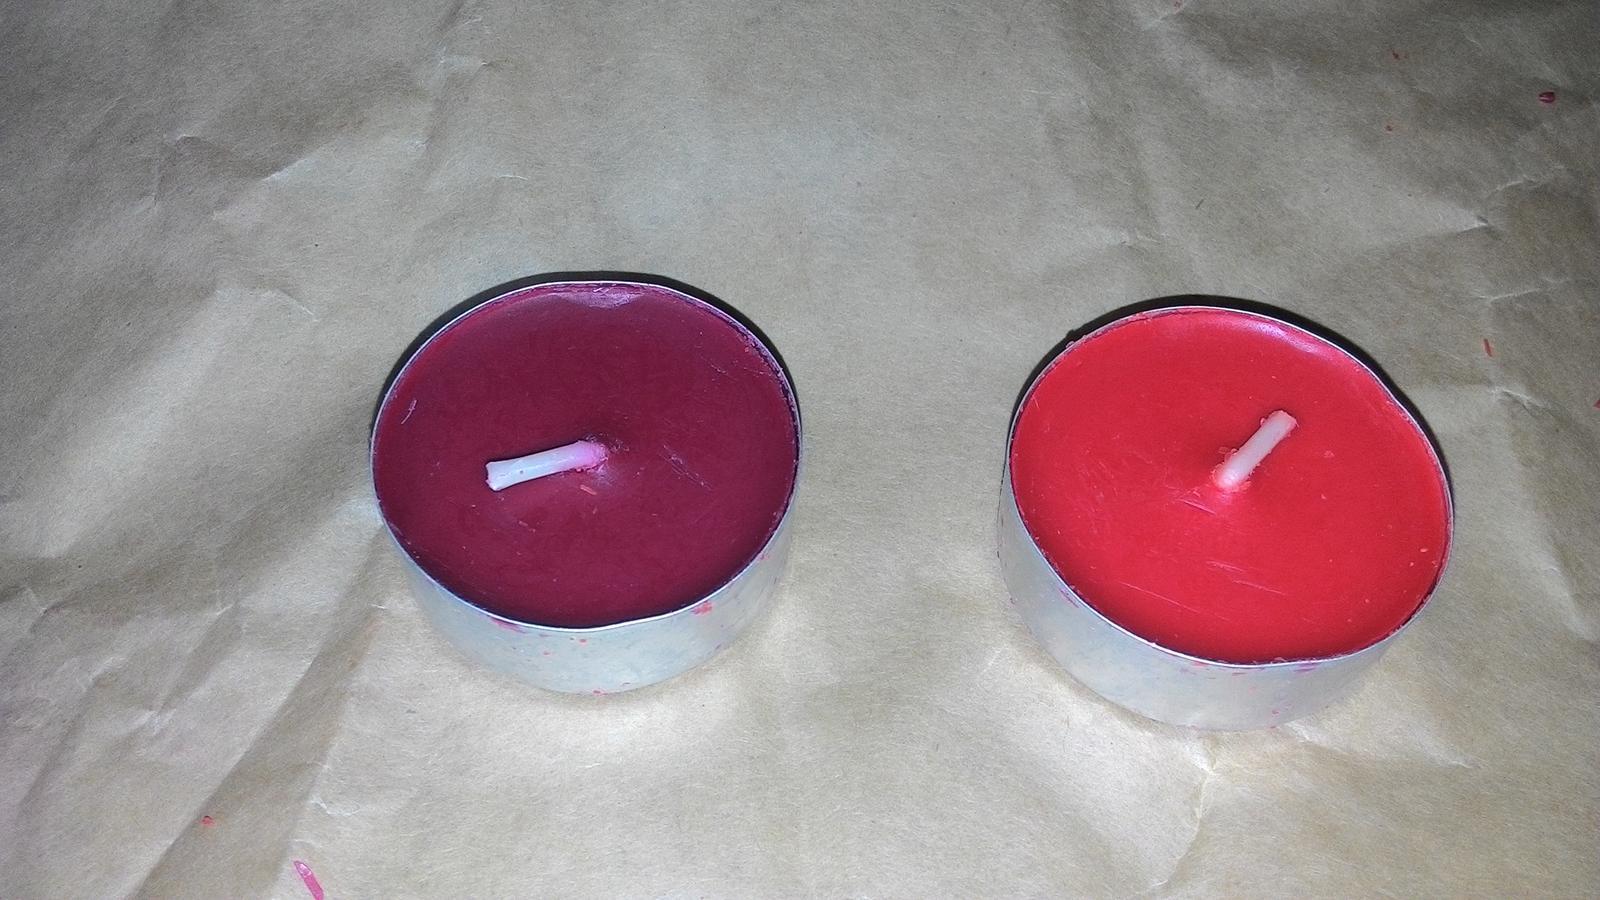 cajove svicky cervene/vinove - Obrázek č. 1